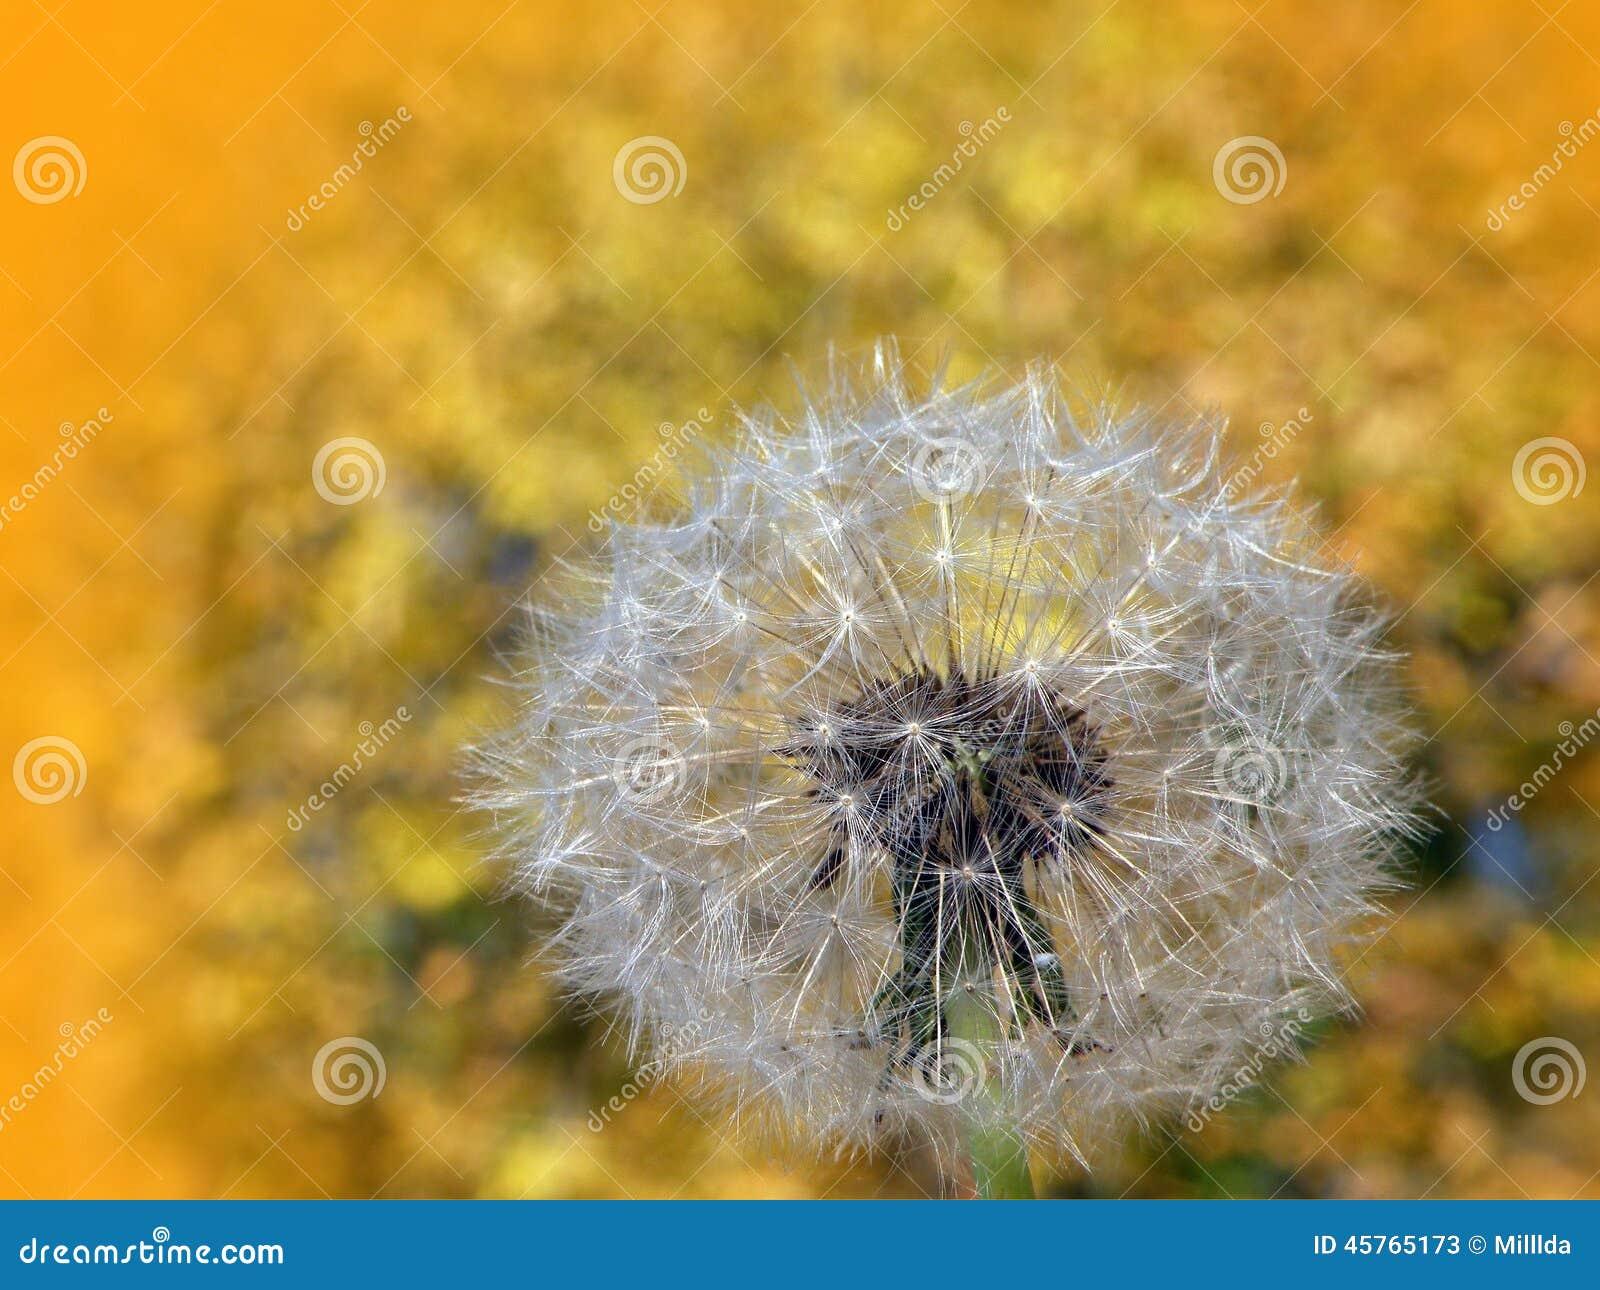 Dandelions fluff